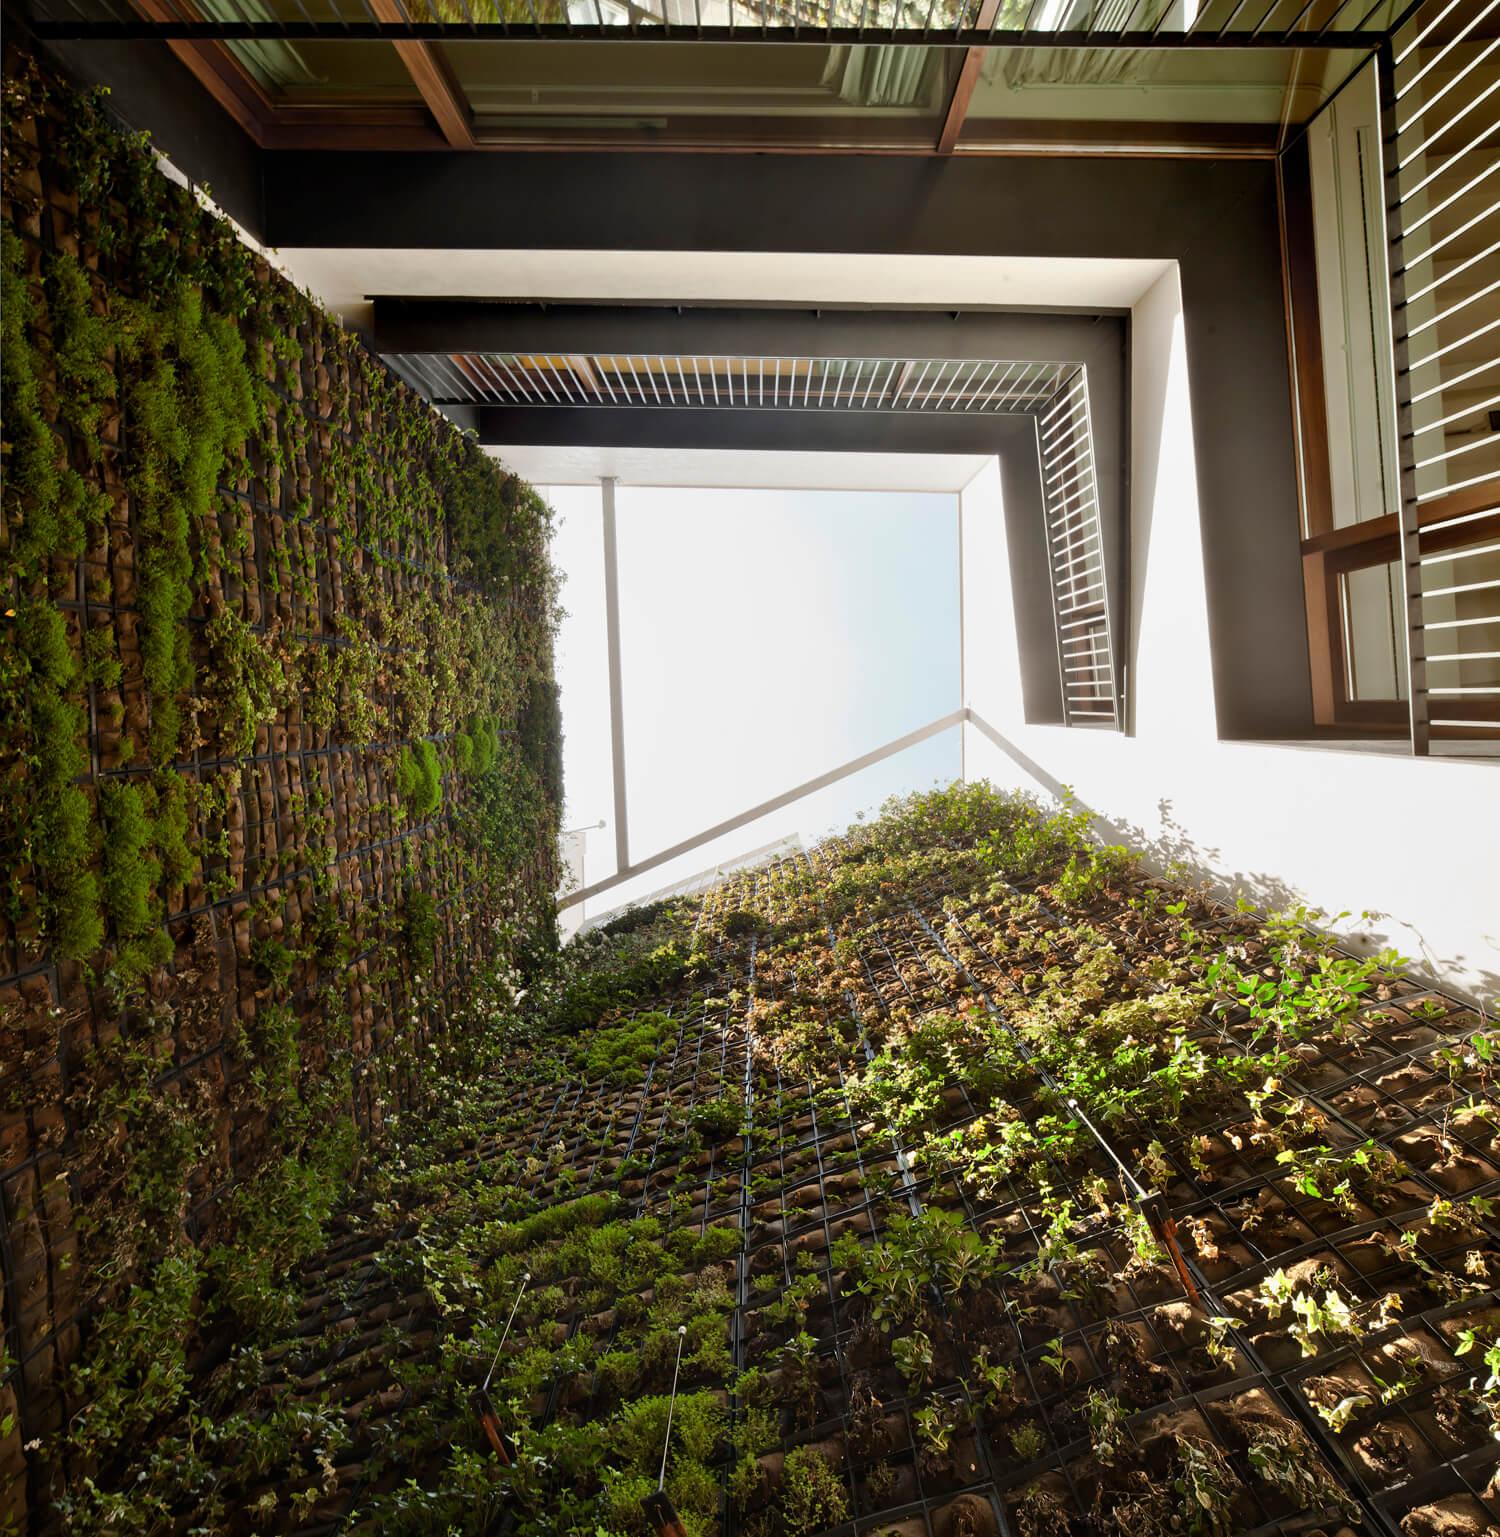 planell-hirsch_arquitectura_rehabilitacion_interiorismo_barcelona_born_mirallers_patio-verde_adriagoula_3002+03